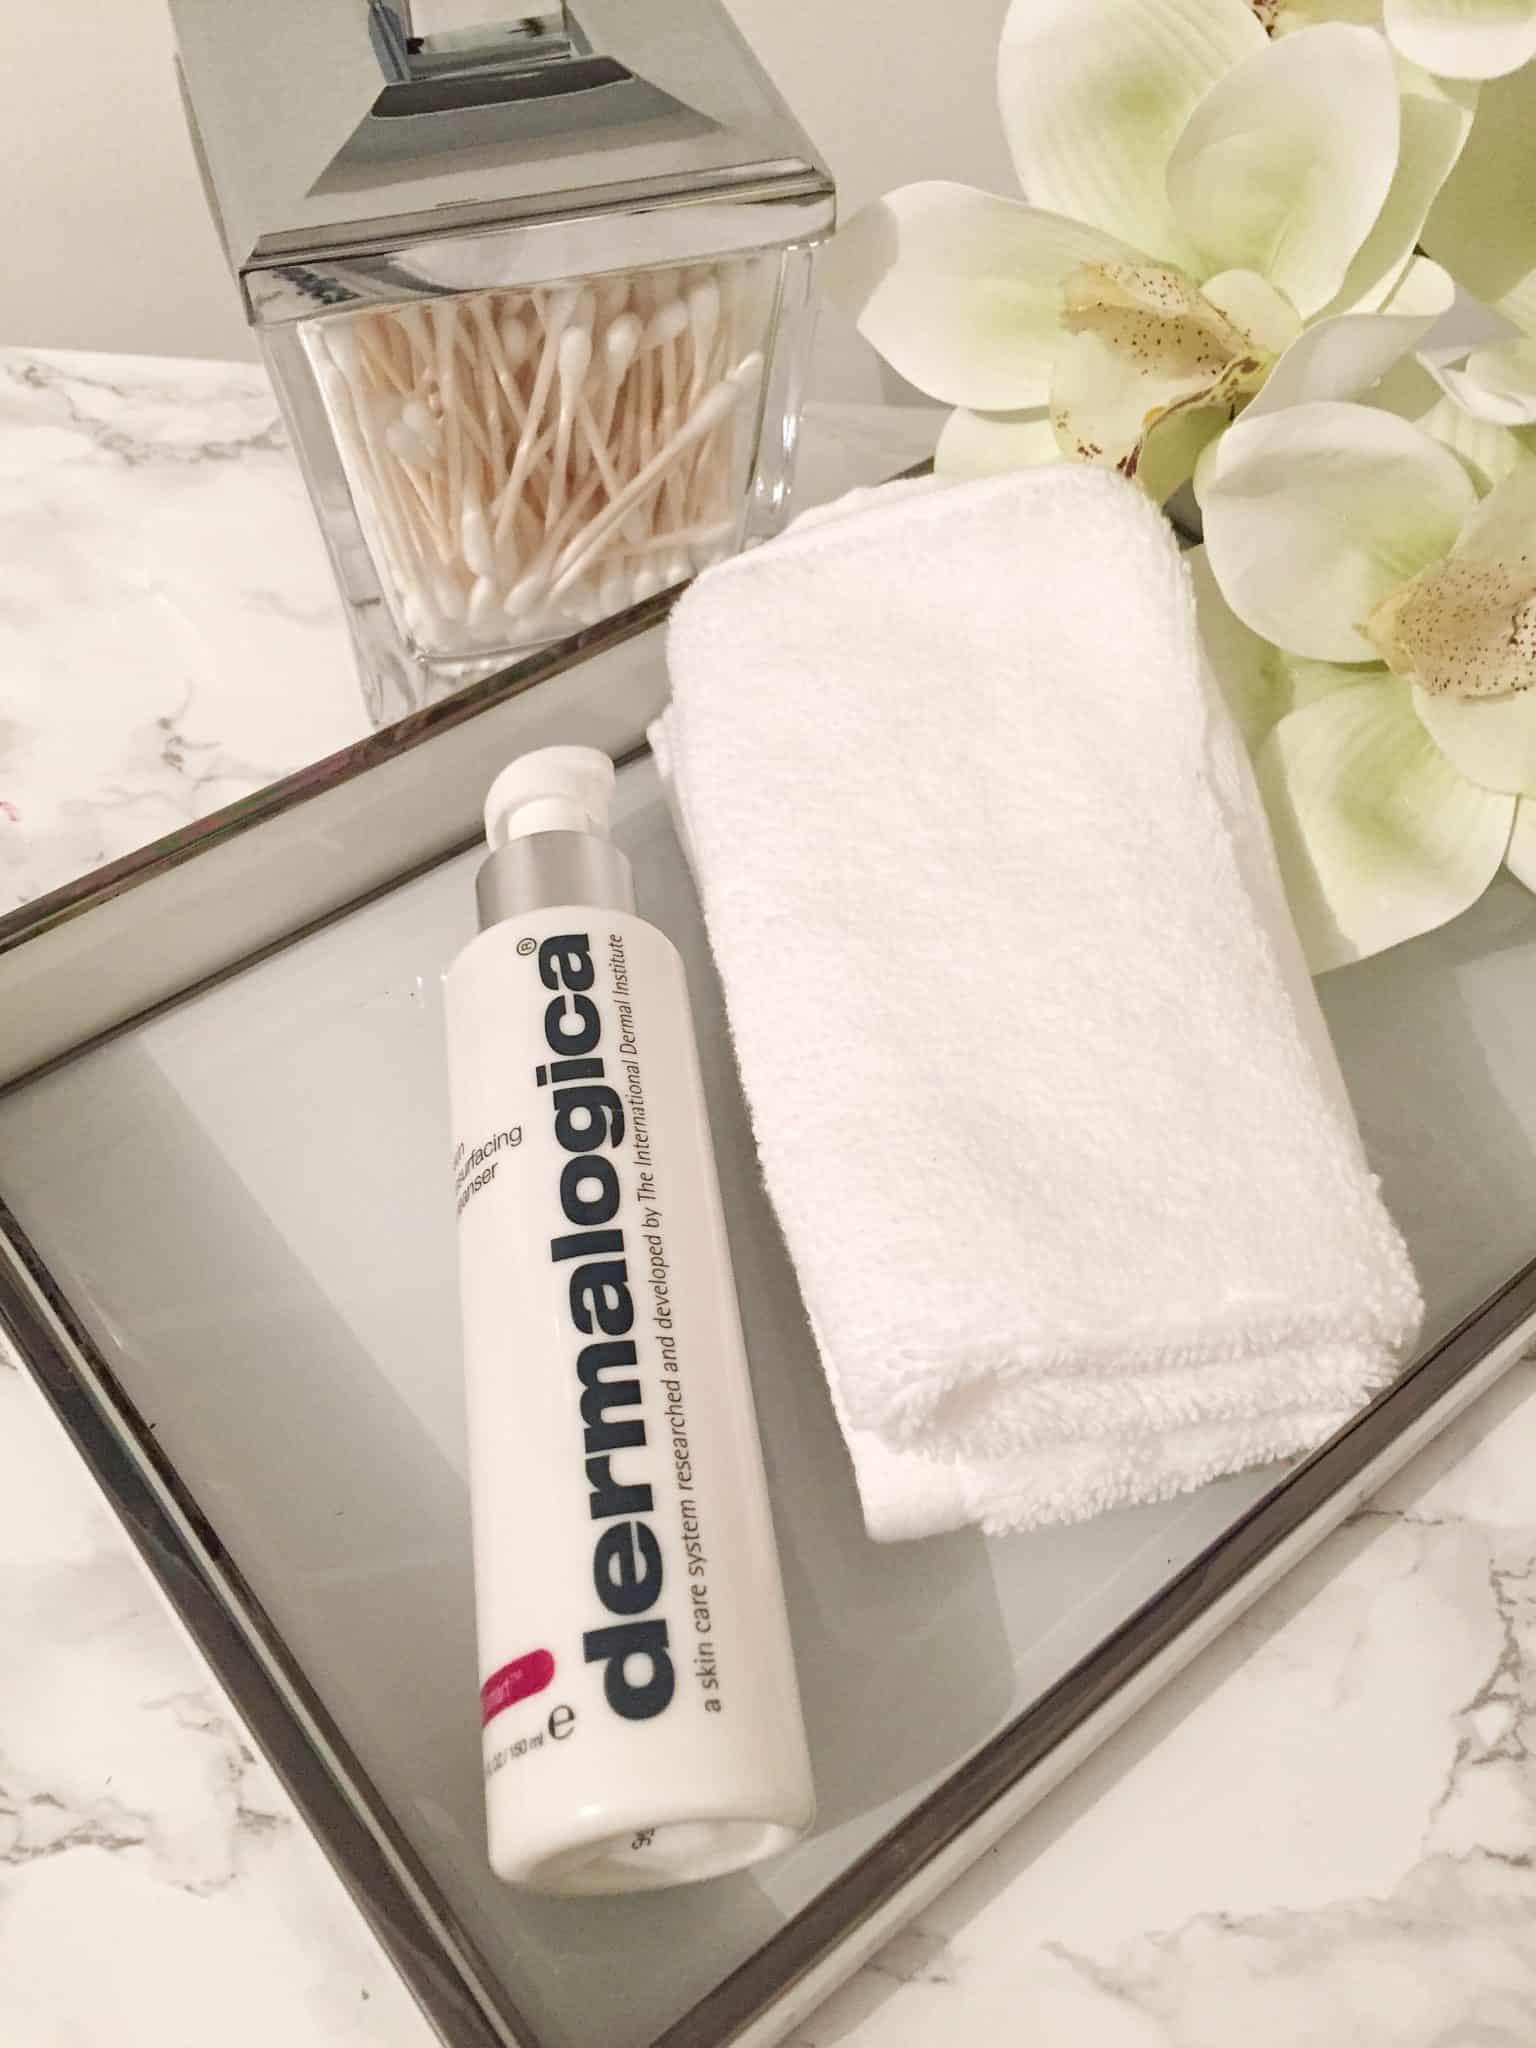 DermalogicaAGE Smart Skin Resurfacing Cleanser Review